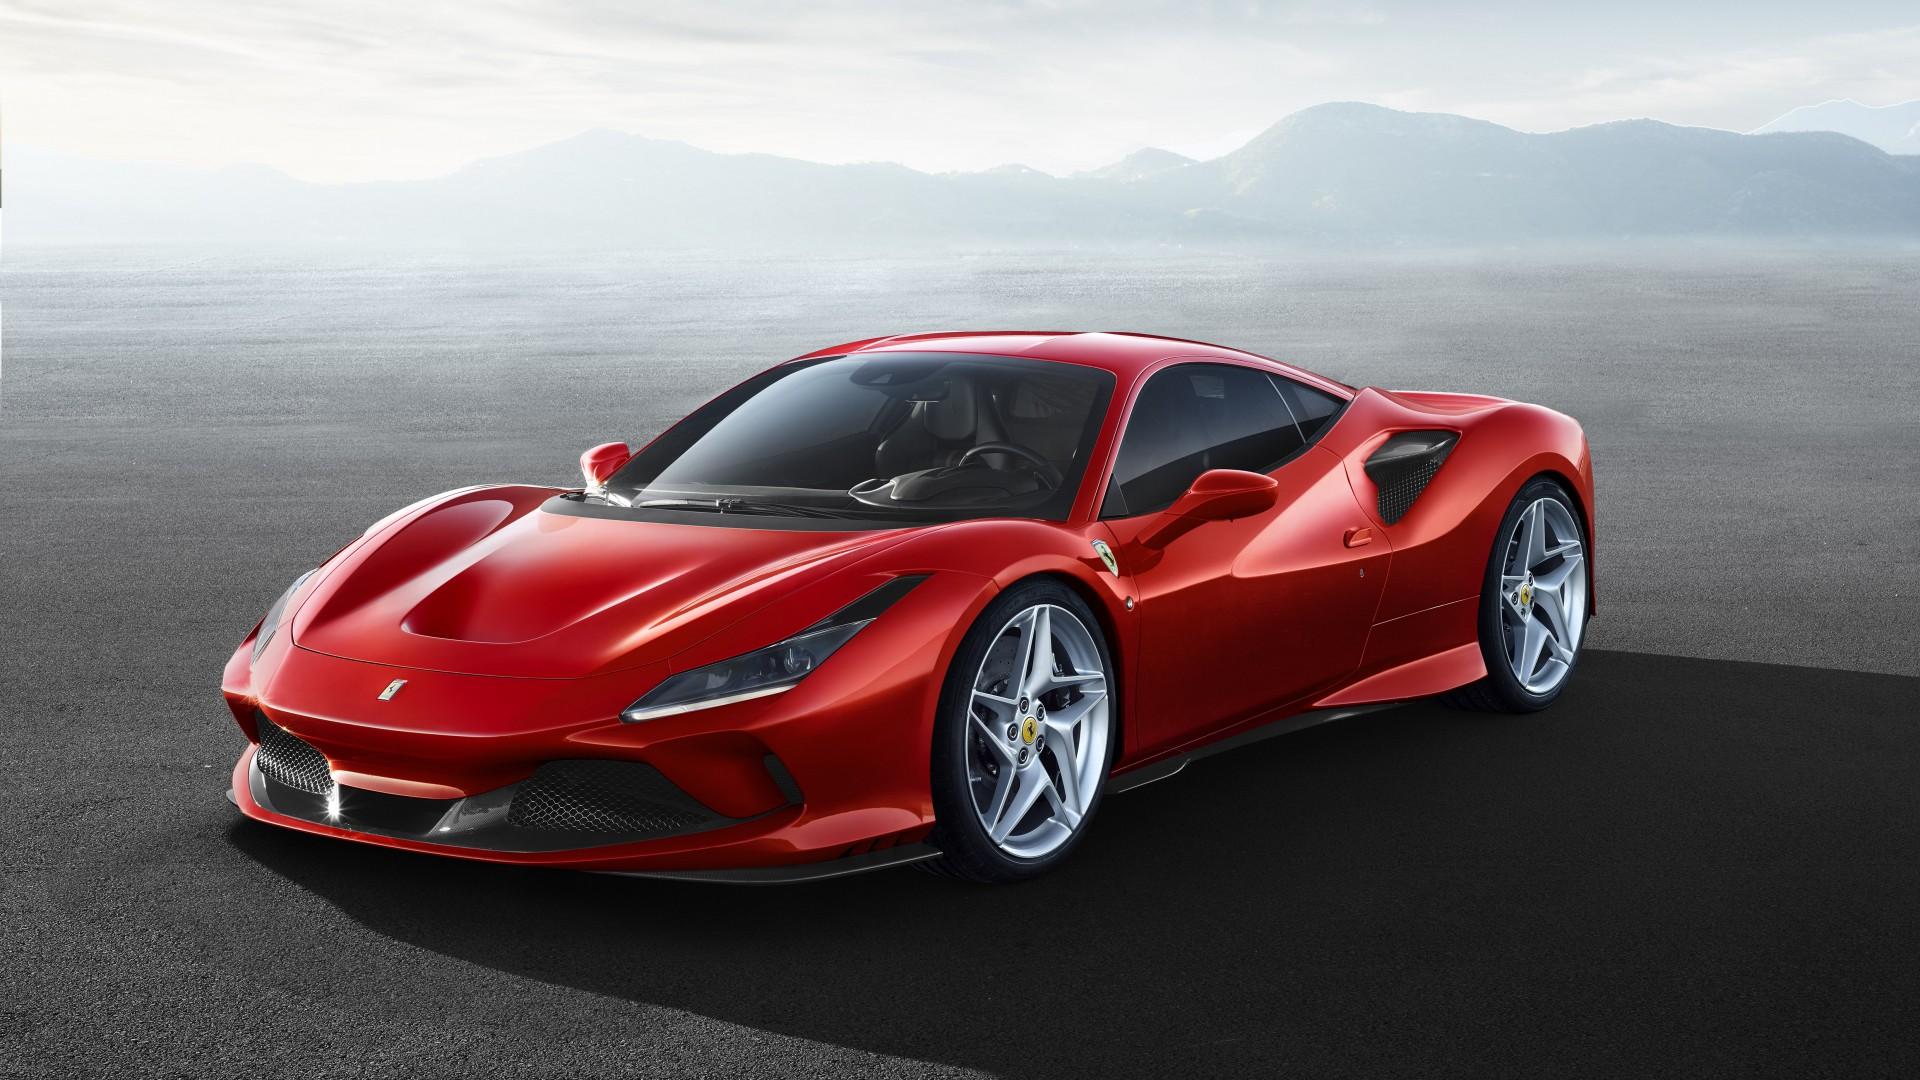 2019 Cars: Wallpaper Ferrari F8 Tributo, 2019 Cars, Supercar, Geneva